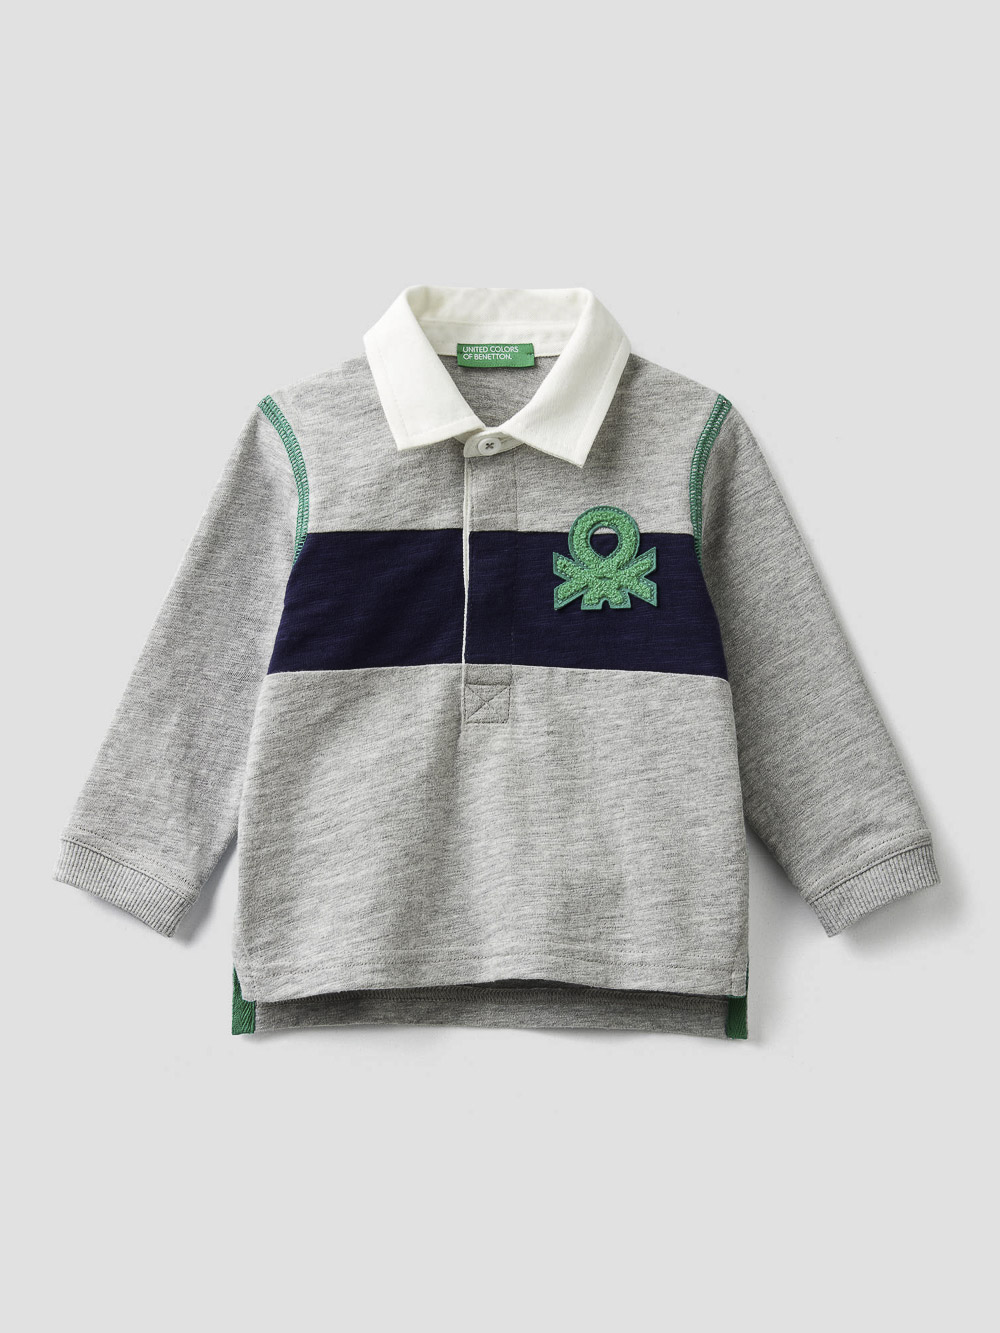 012 BENETTON Μπλούζα πόλο με φάσα κια λογότυπο 3BHJC3146 20A501